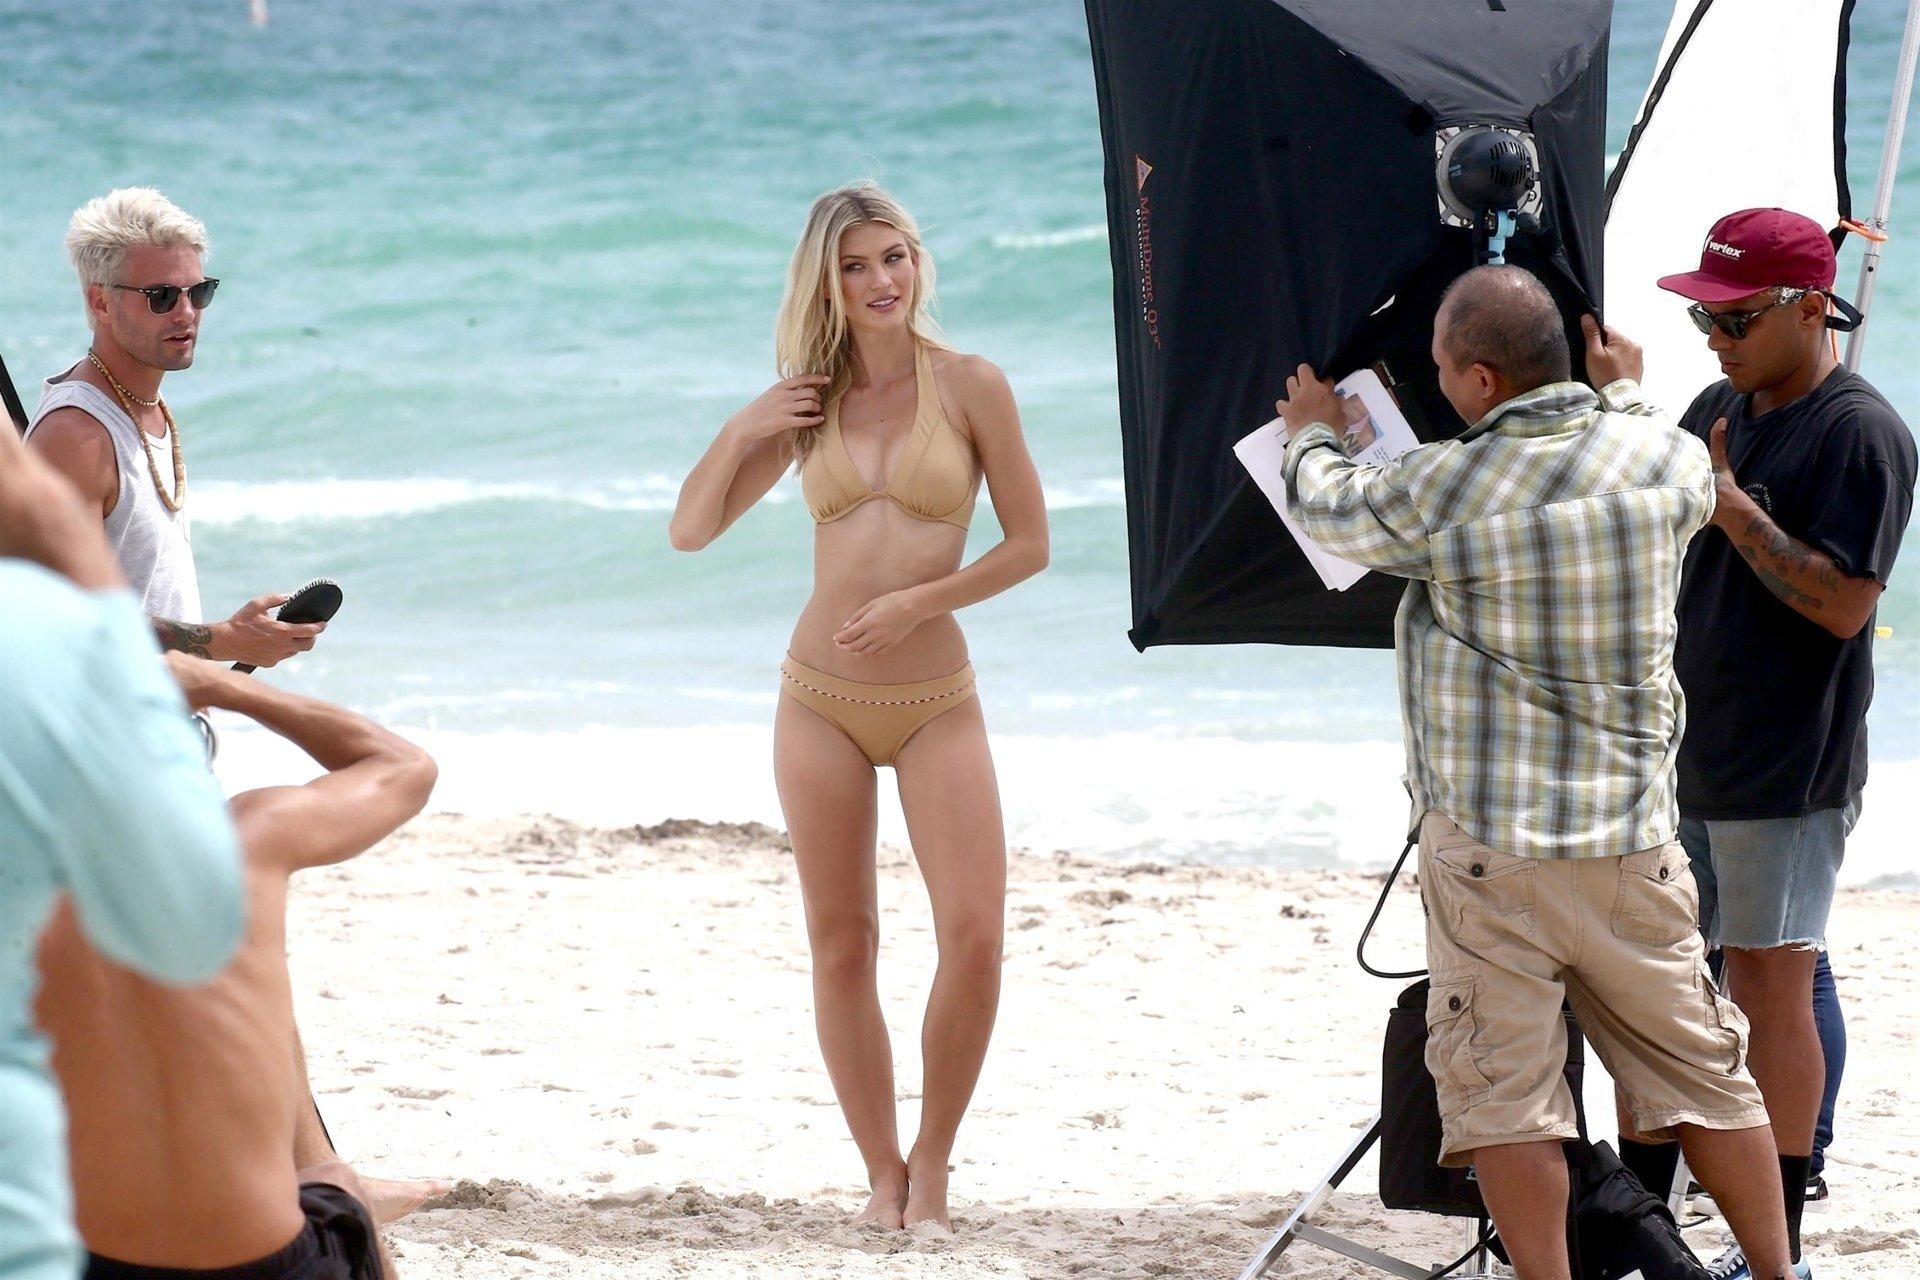 Watch Andrea cronberg topless video